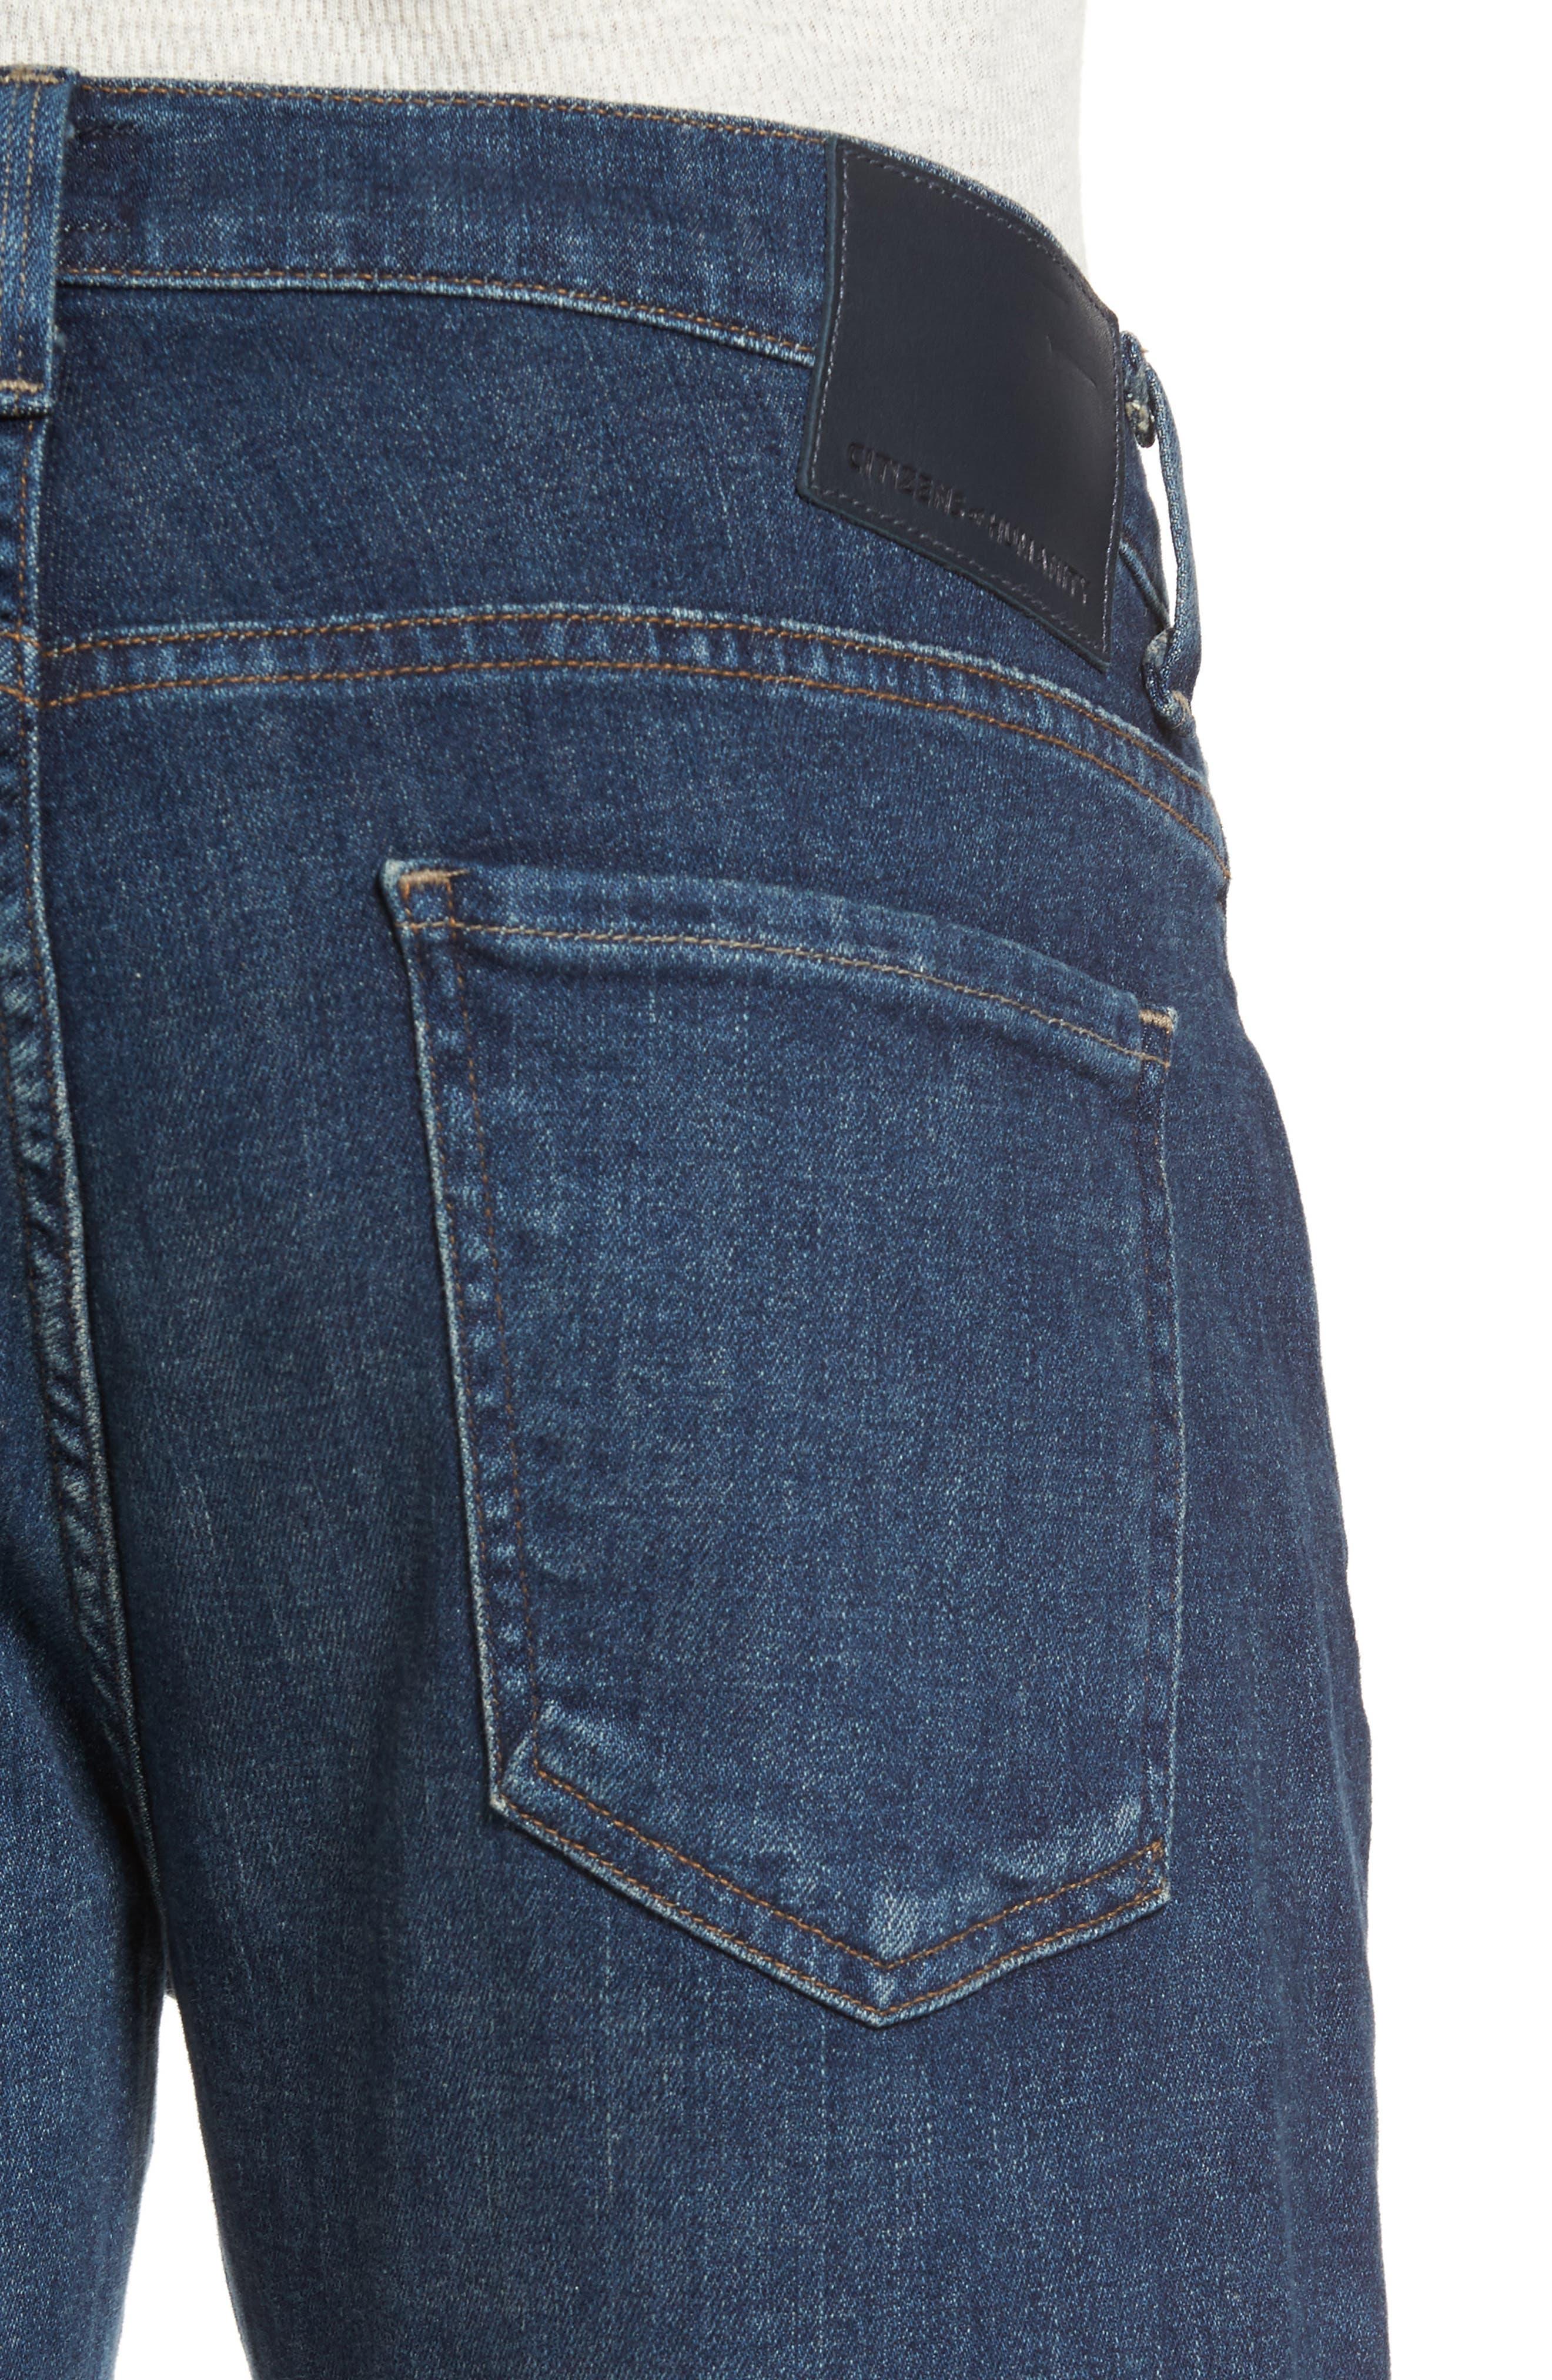 Sid Straight Leg Jeans,                             Alternate thumbnail 4, color,                             Eastgate